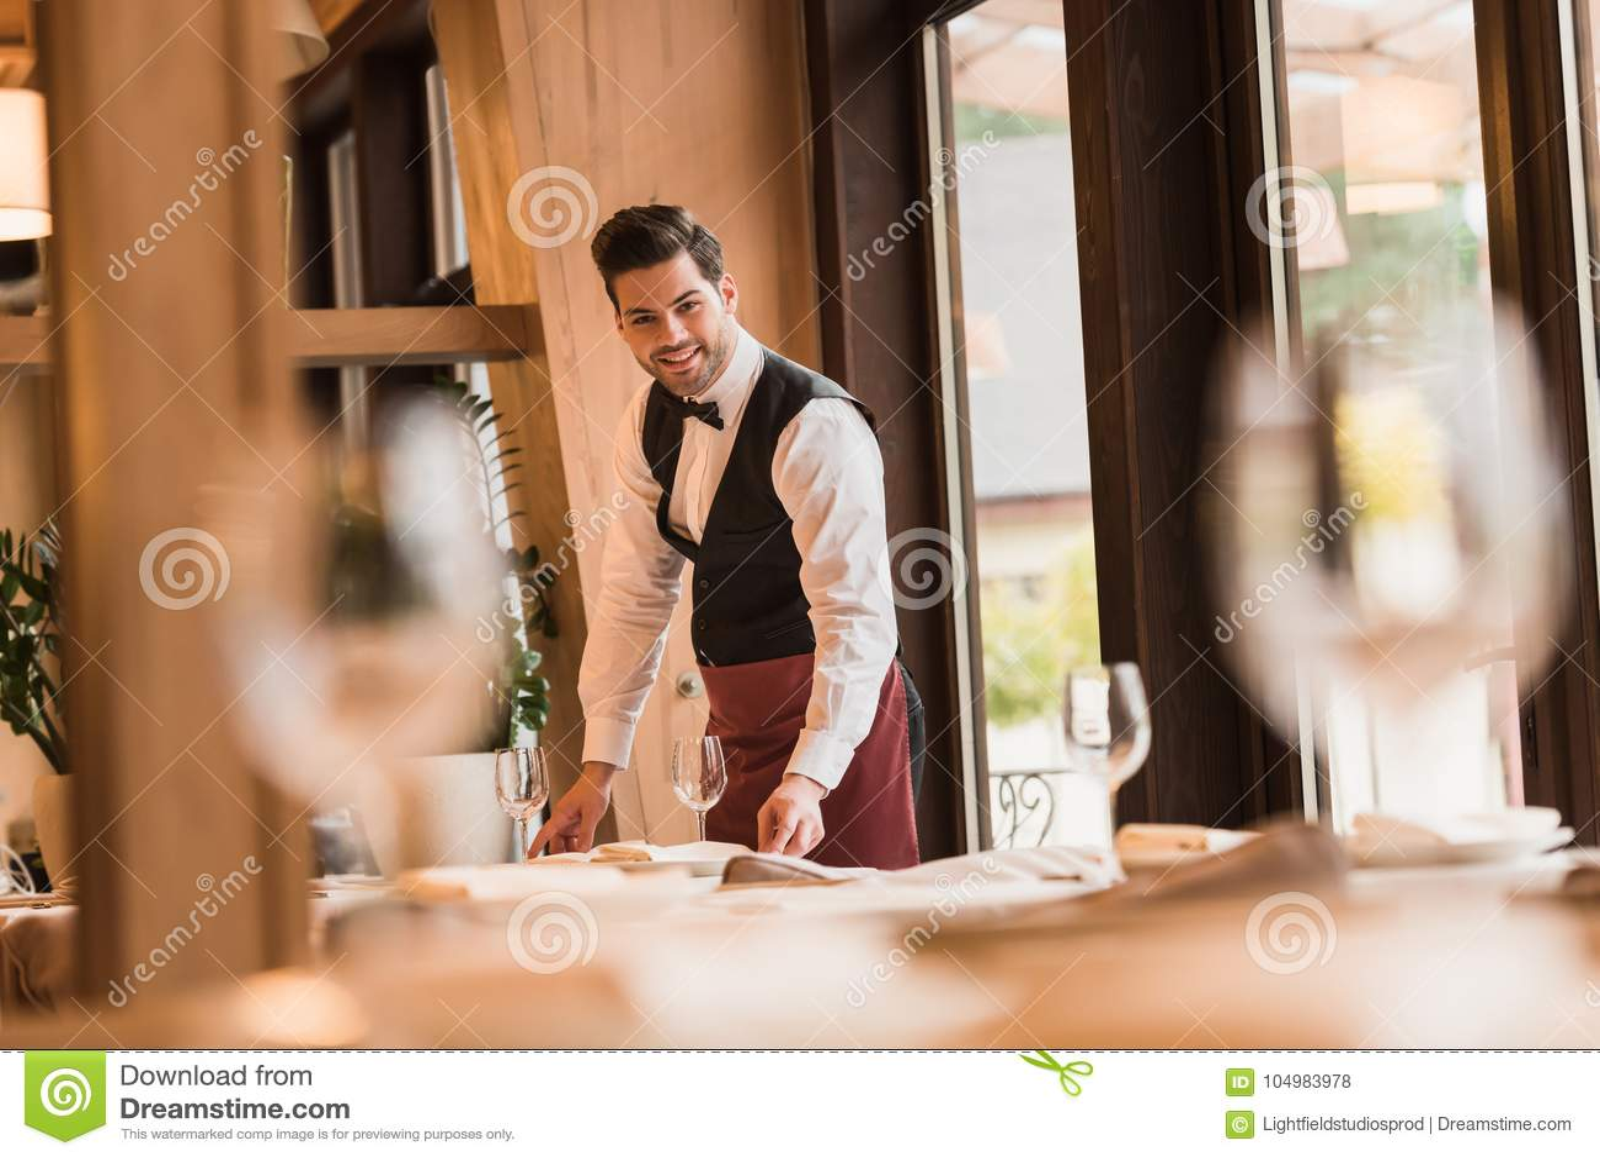 Waiter serving tables